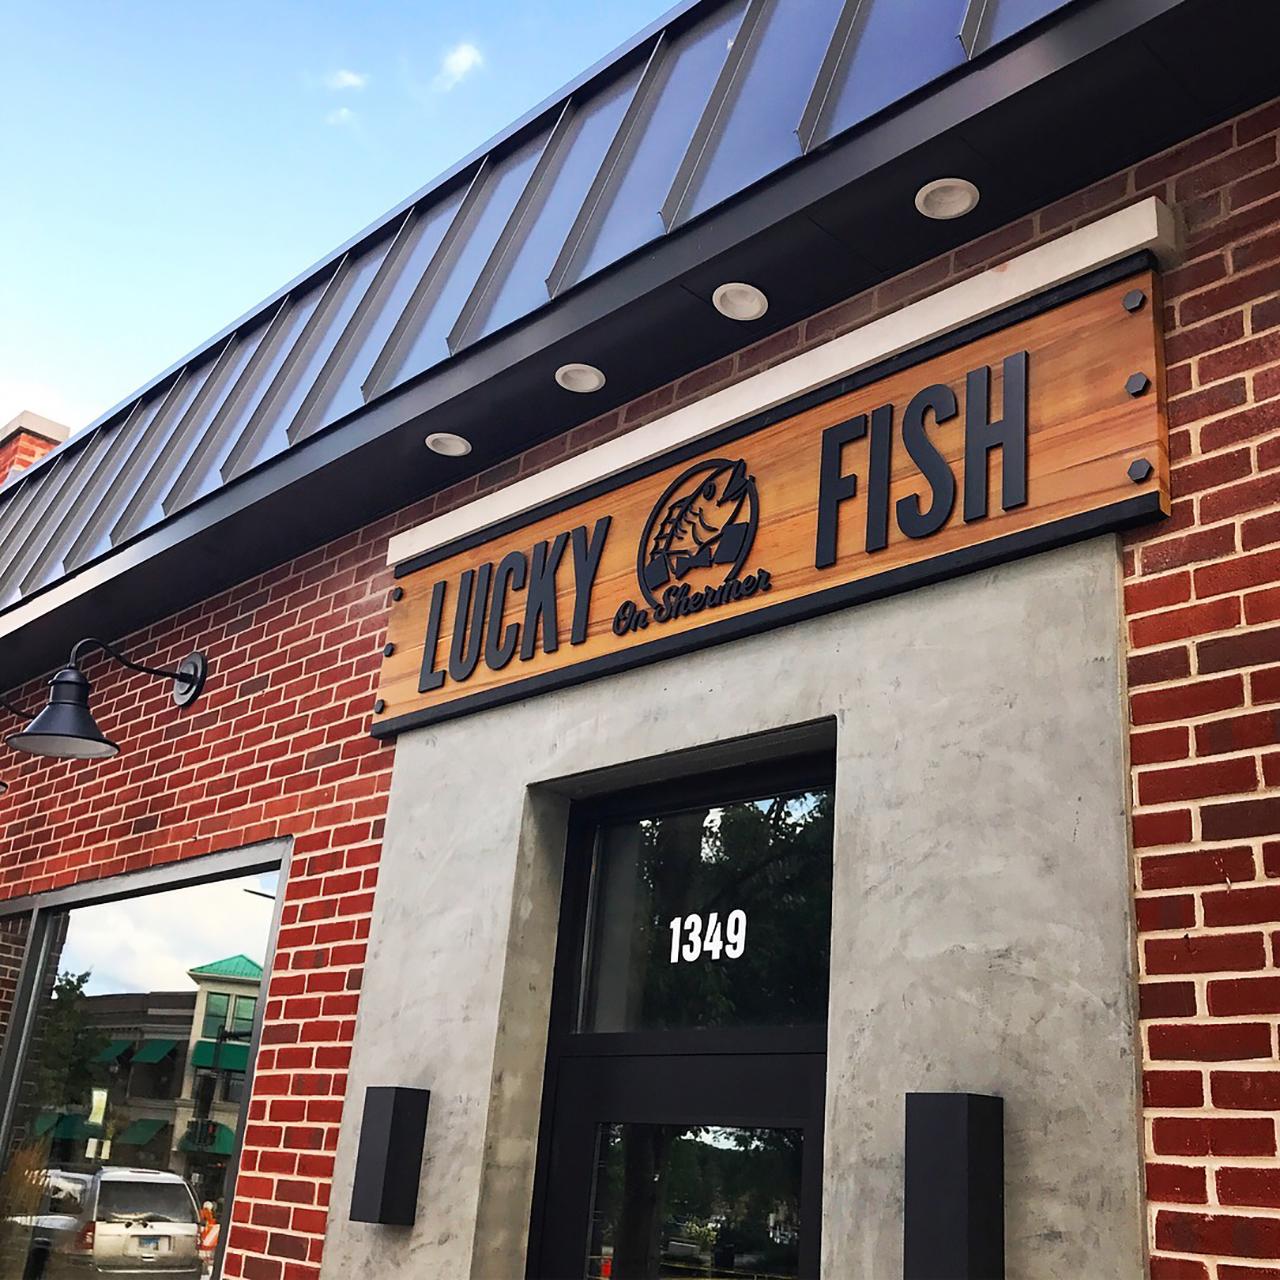 Restaurant, fish, lucky fish, branding, spatial design, signage, logo, graphic design, design, jselz, chi, Chicago, suburbs, foodie